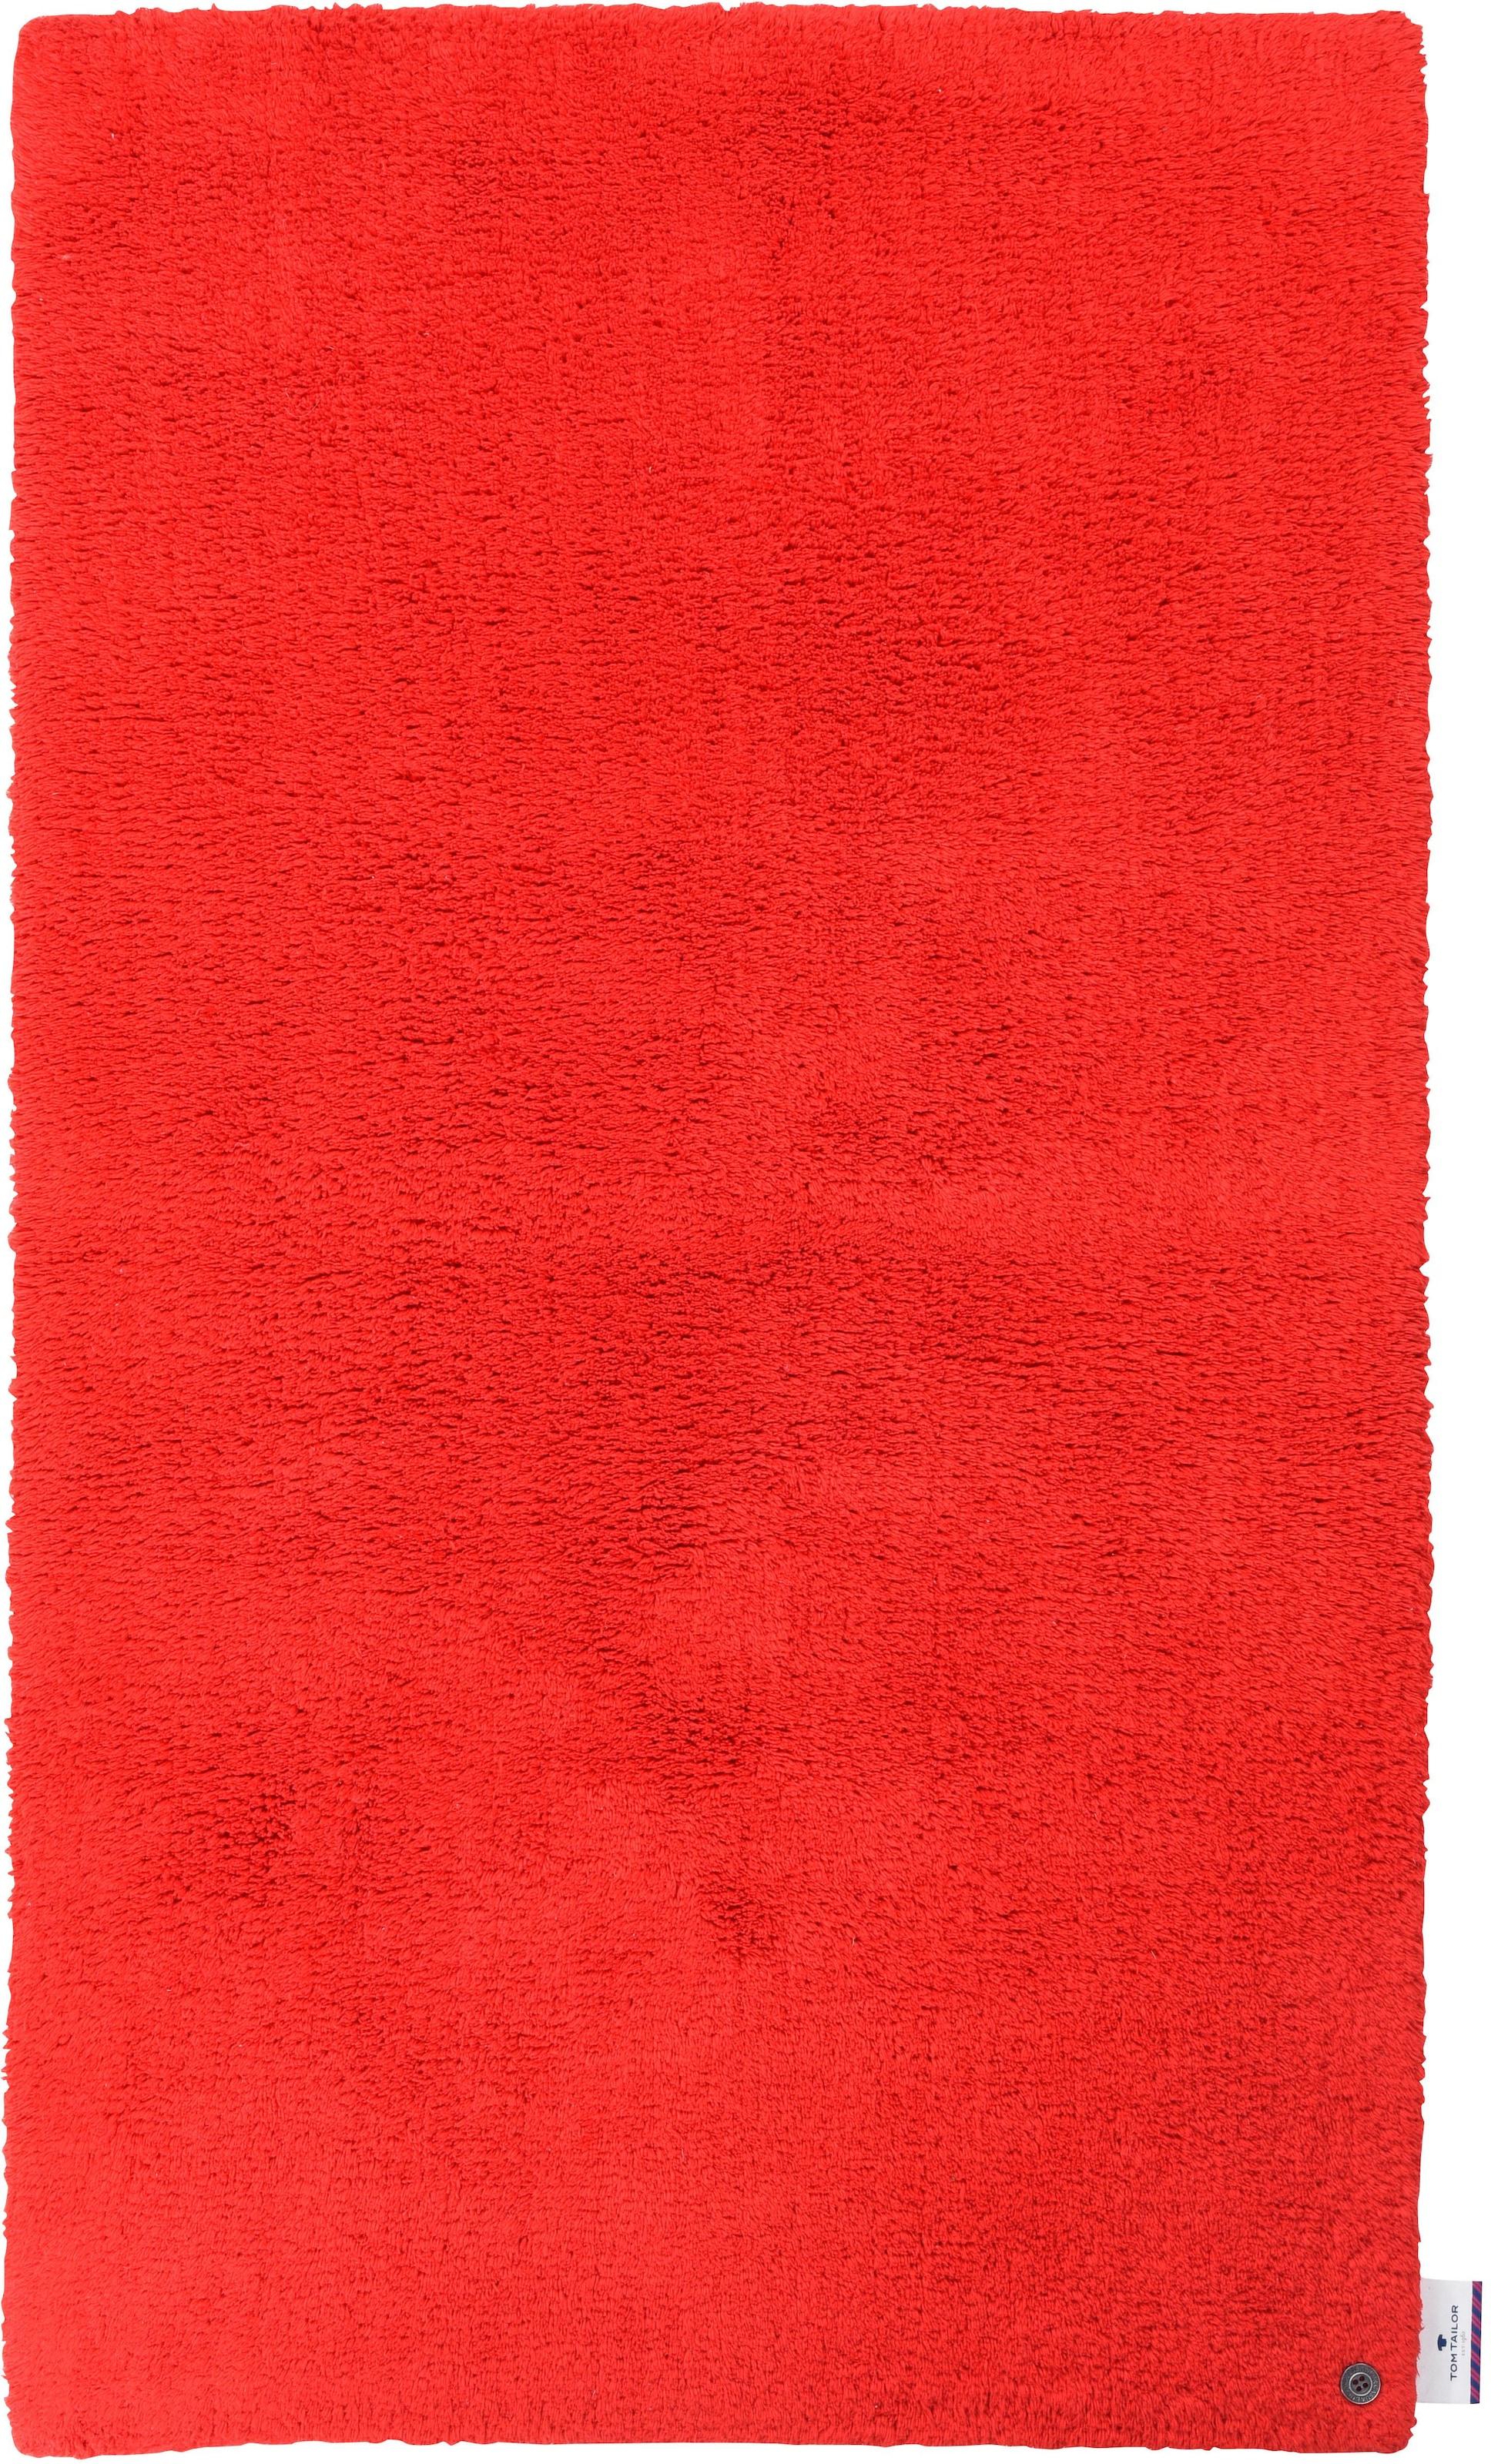 Image of Badematte »Cotton Double Uni«, TOM TAILOR, Höhe 20 mm